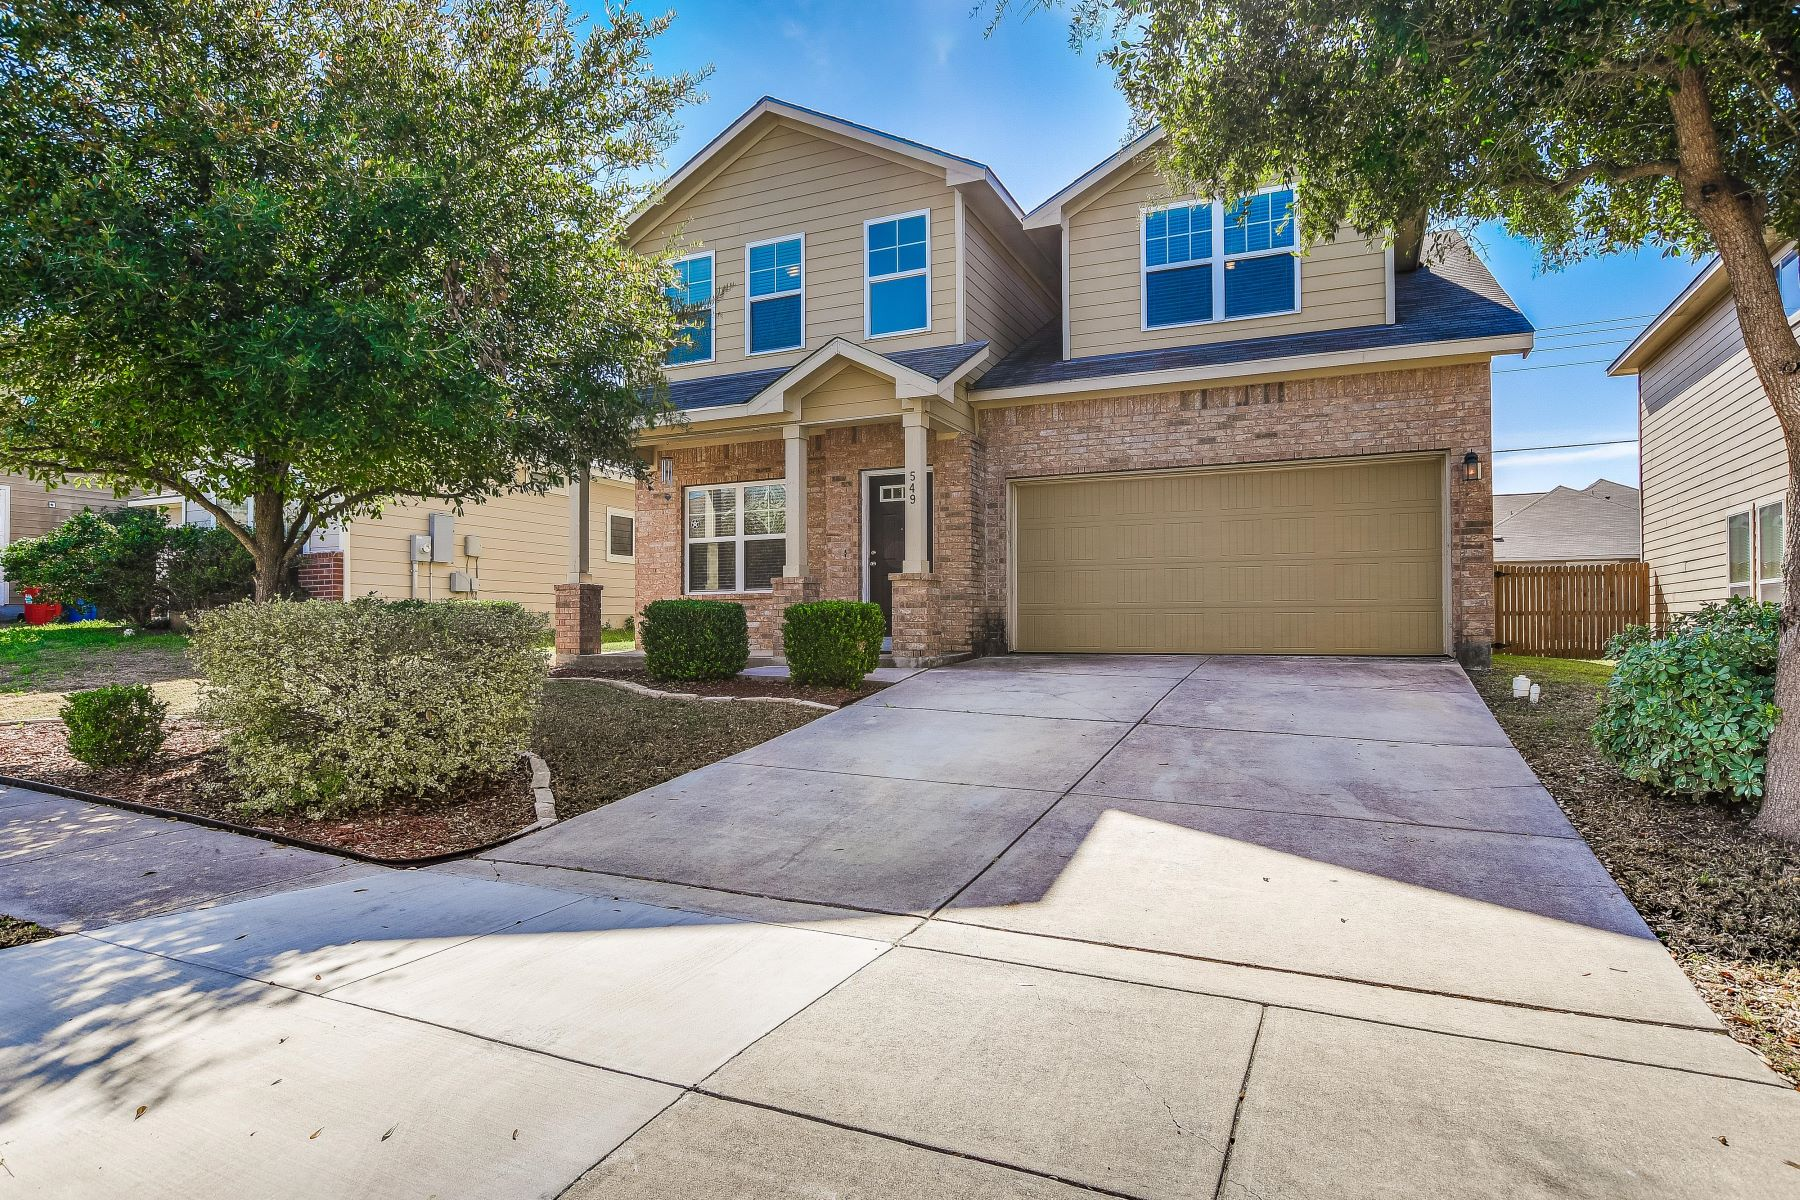 Single Family Homes für Verkauf beim Beautiful Two Story Home located in Stonebrook 549 Slippery Rock, Cibolo, Texas 78108 Vereinigte Staaten